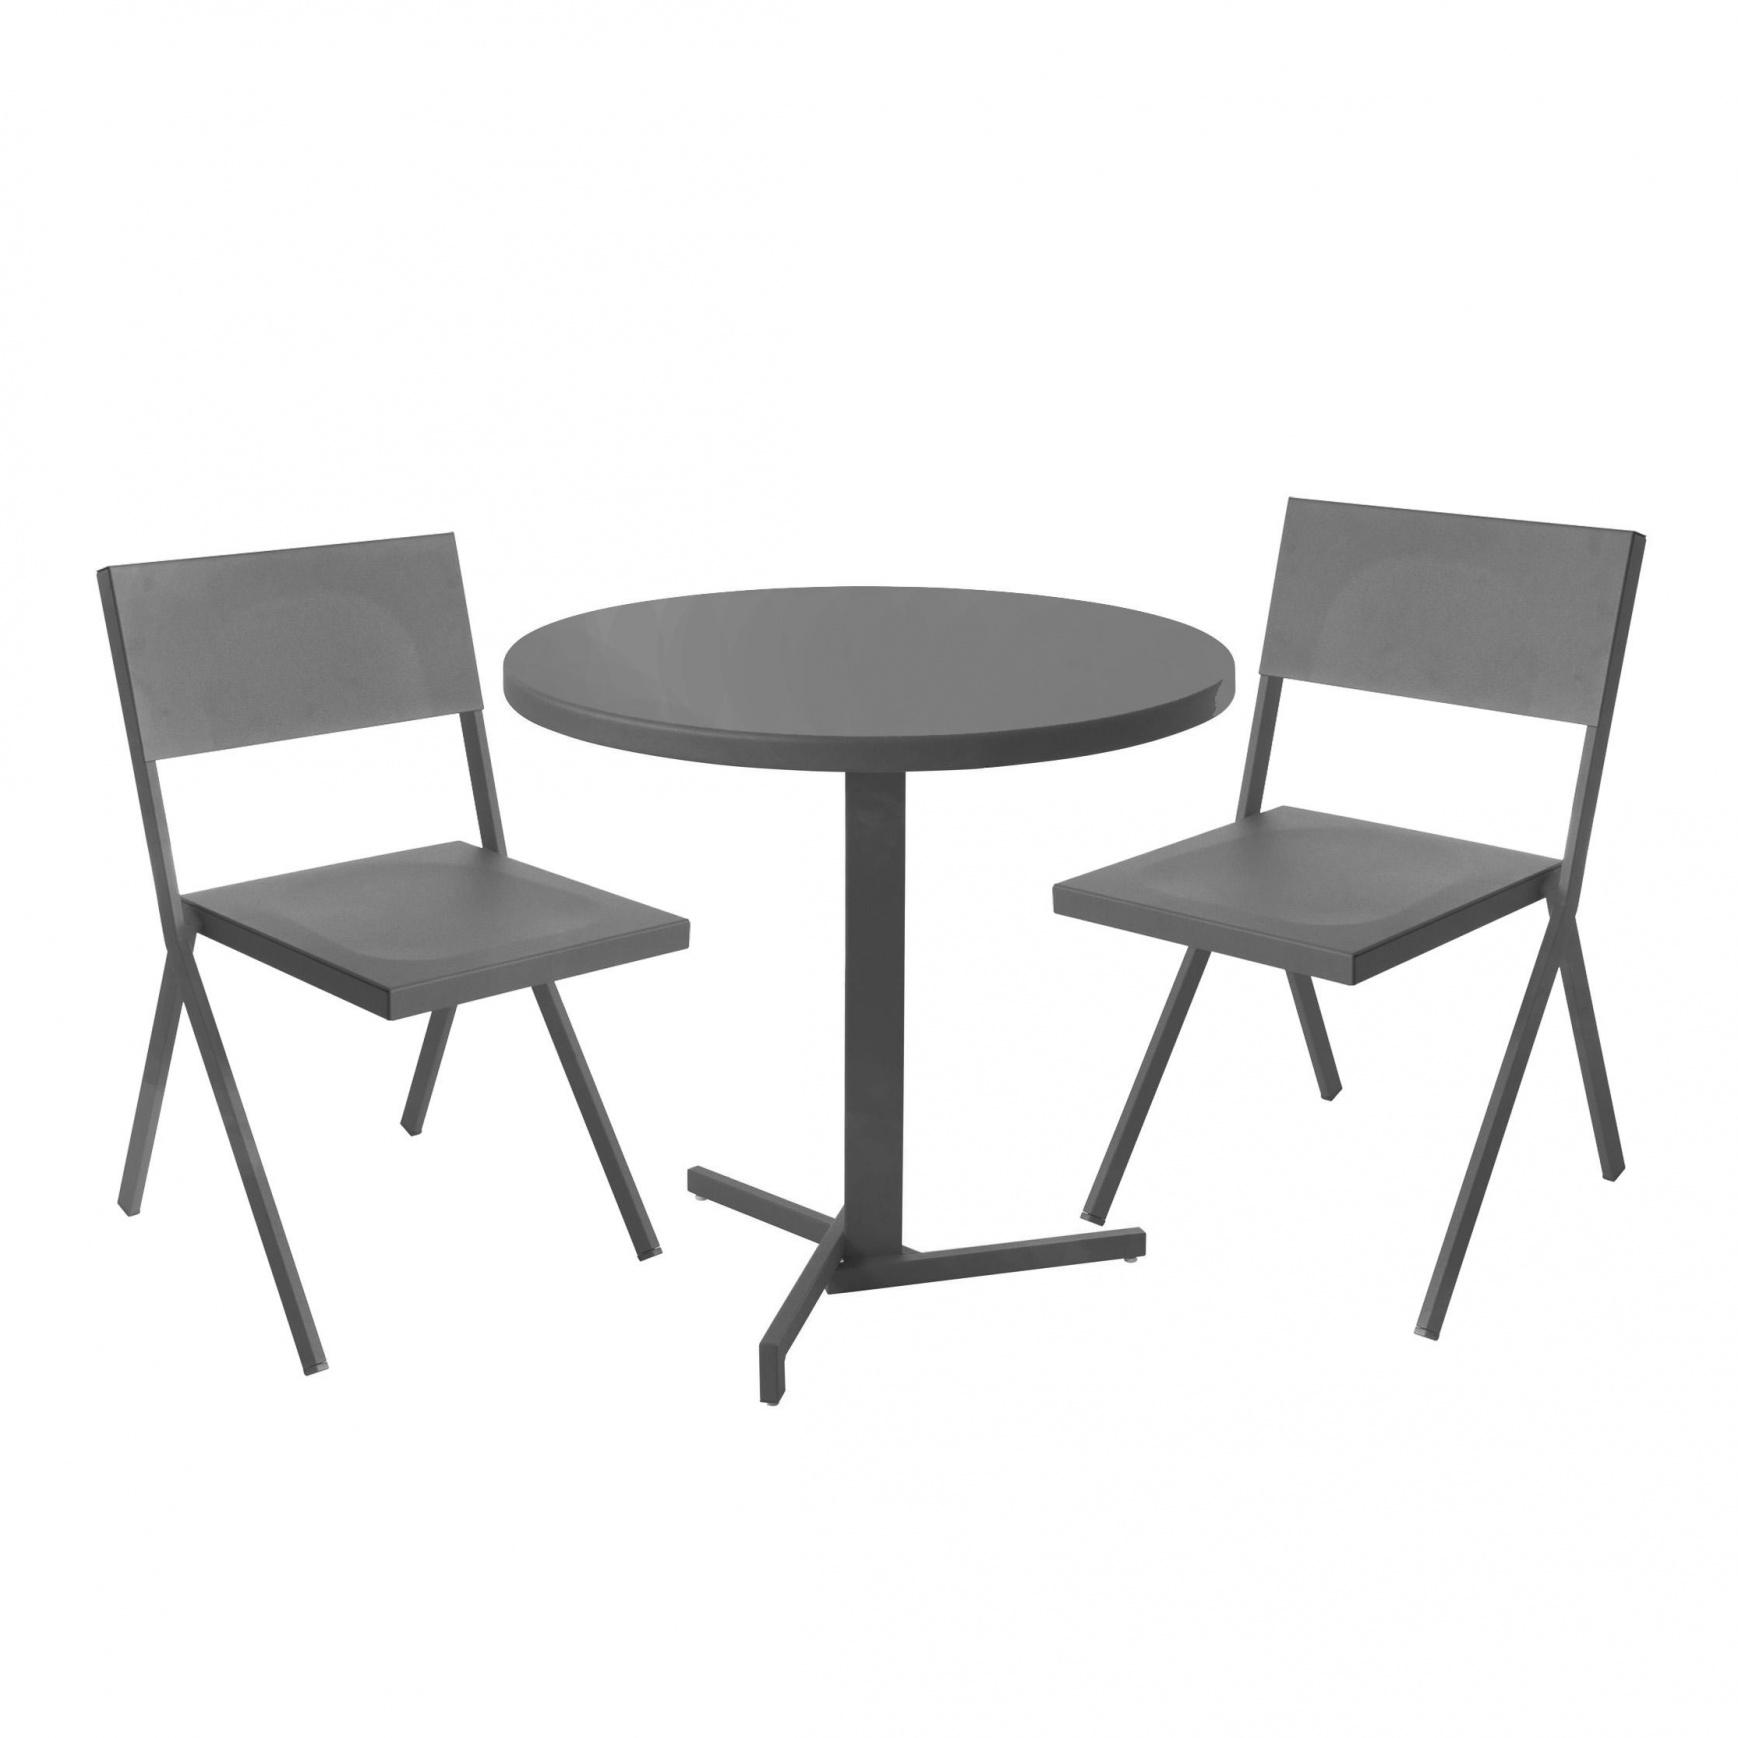 code promo mia bons et codes de r ductions mia. Black Bedroom Furniture Sets. Home Design Ideas